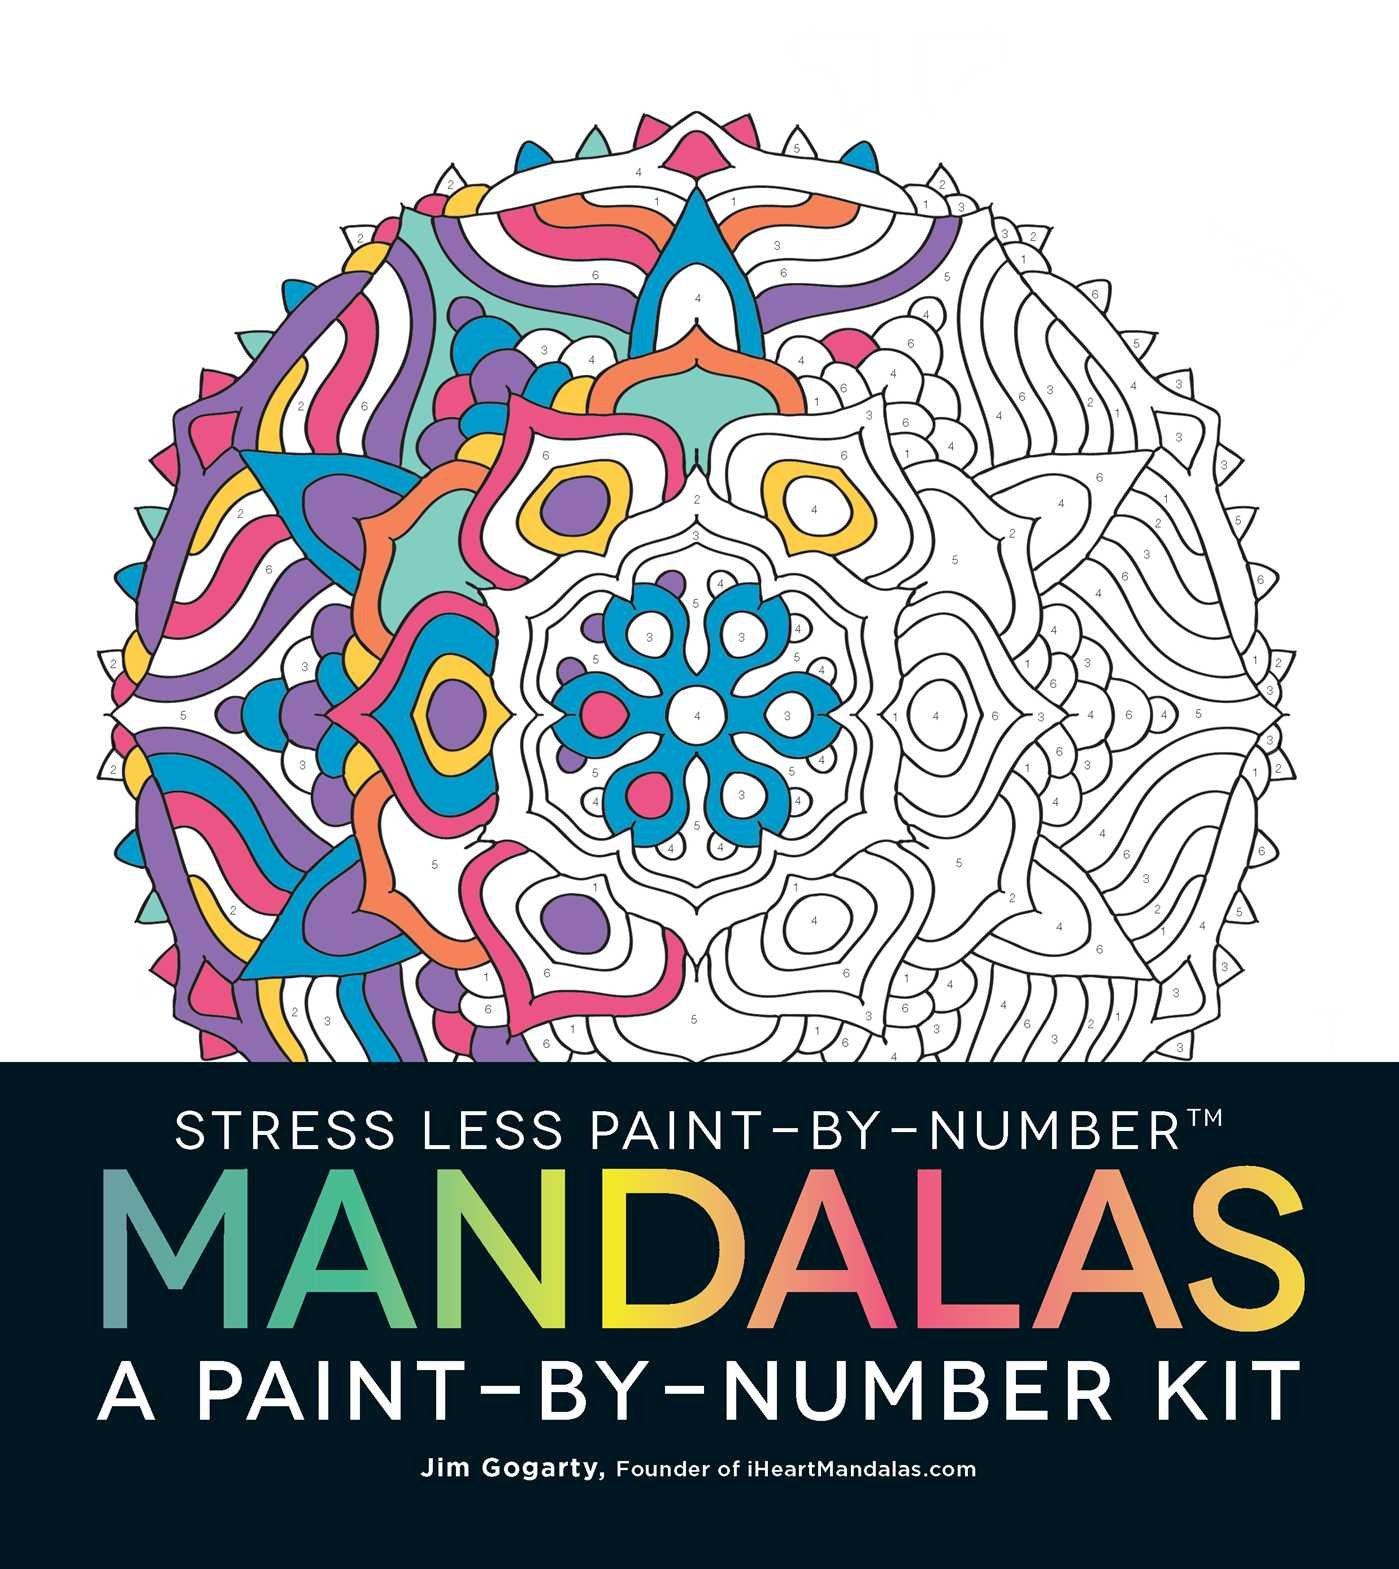 Stress less coloring by the shore - Amazon Com Stress Less Paint By Number Mandalas A Paint By Number Kit 9781507200001 Jim Gogarty Books